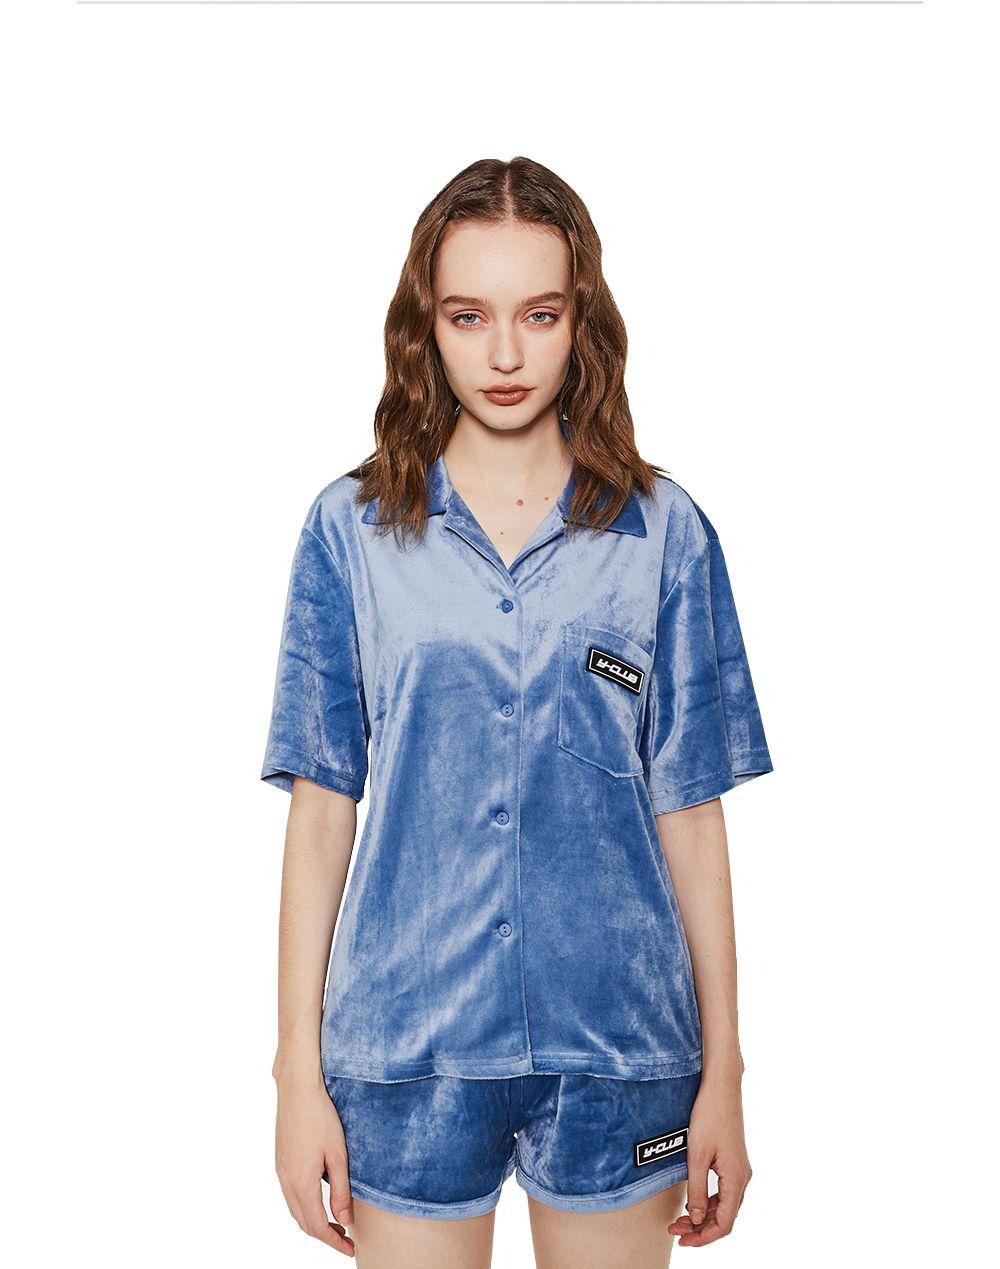 Velvet Shirt-YUYU